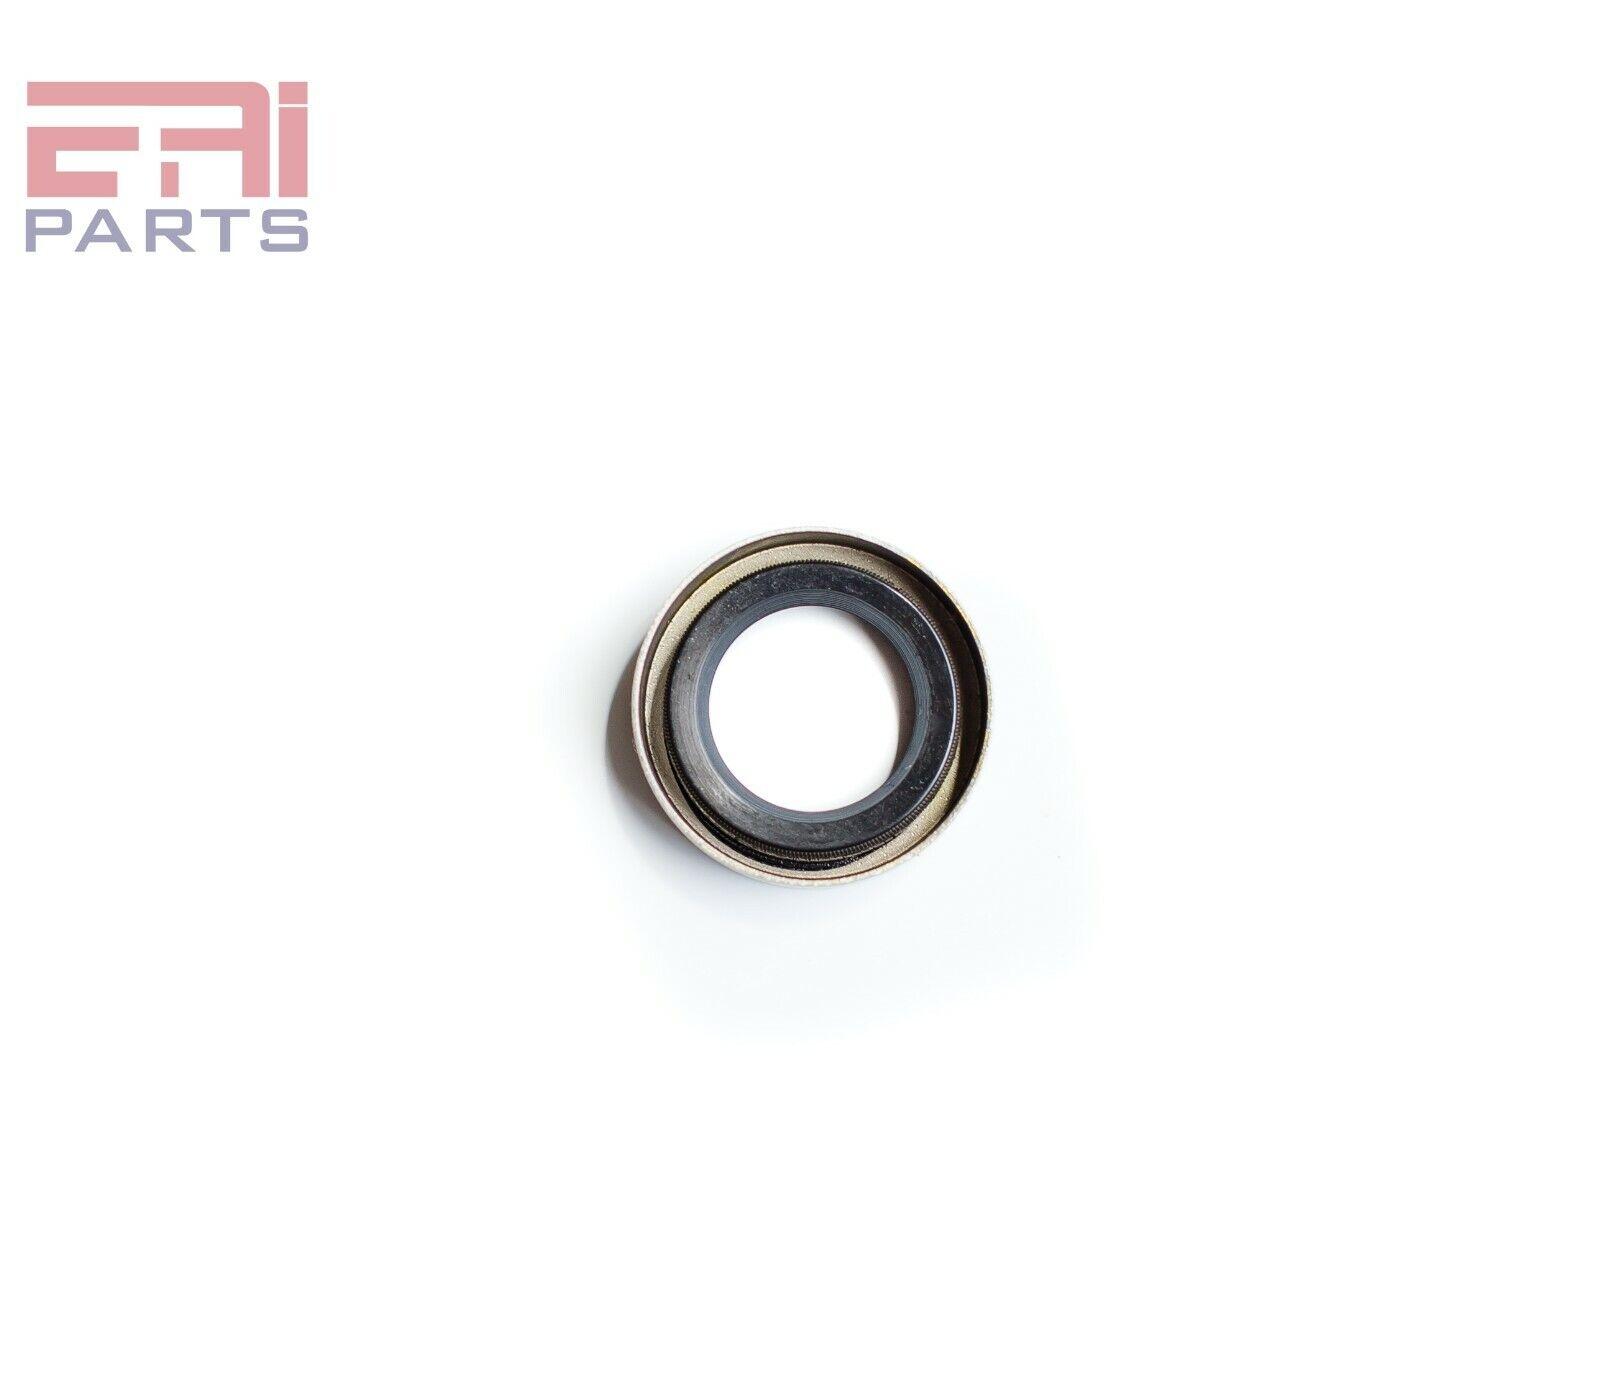 1.25 X 2 X 0.25 TC INCH Oil Seal Factory New!